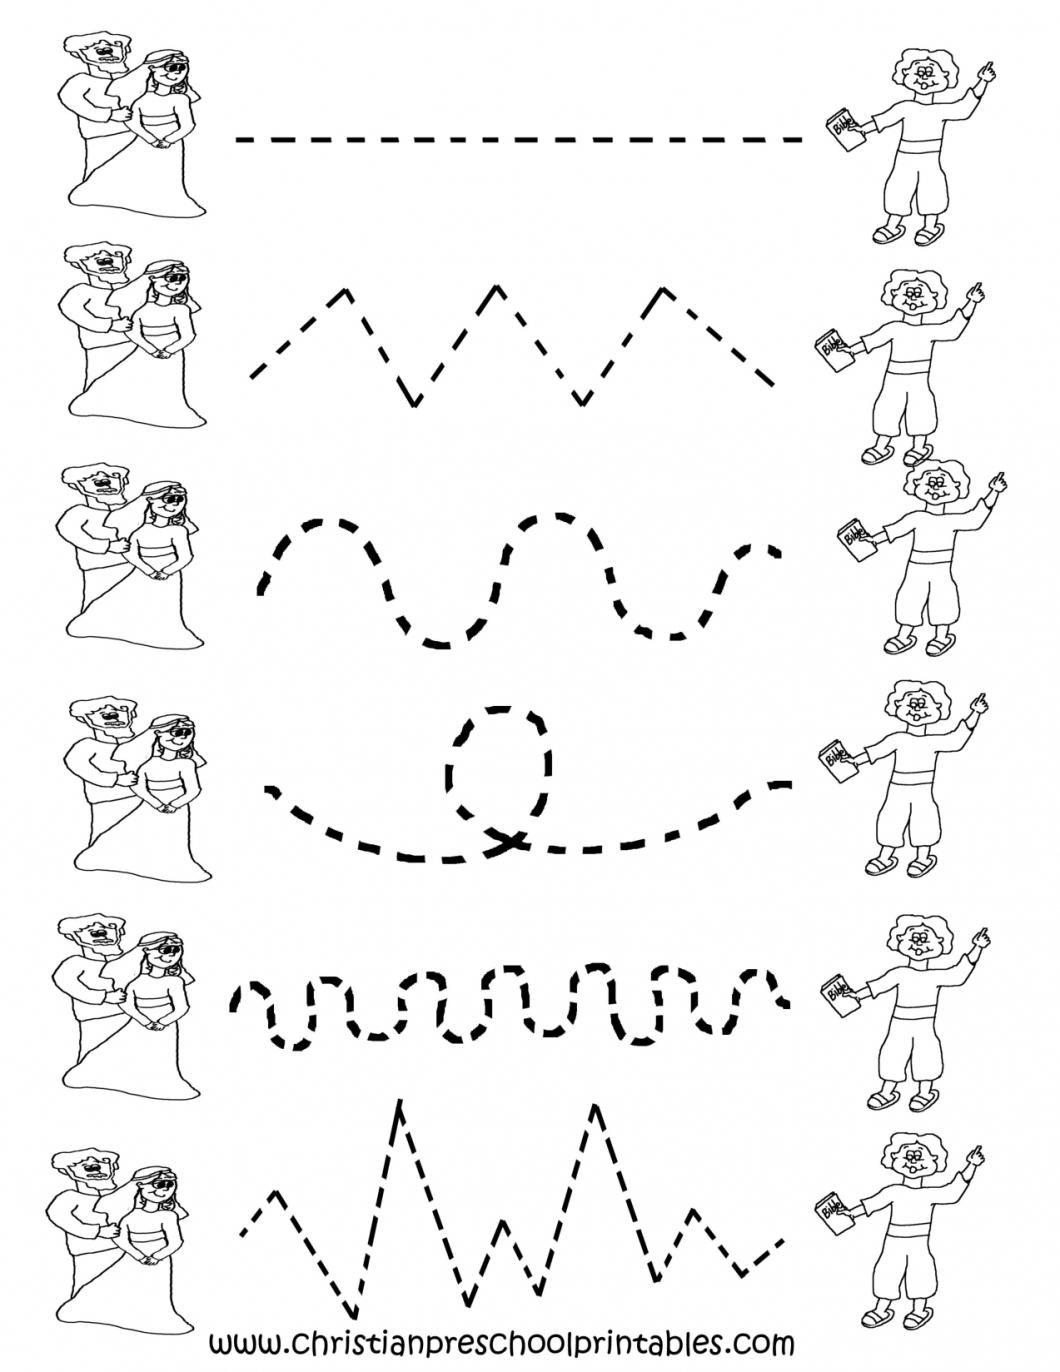 Printable Tracing Worksheets For Preschoolers – With Pre Kinder Free | Free Printable Tracing Worksheets For Preschoolers